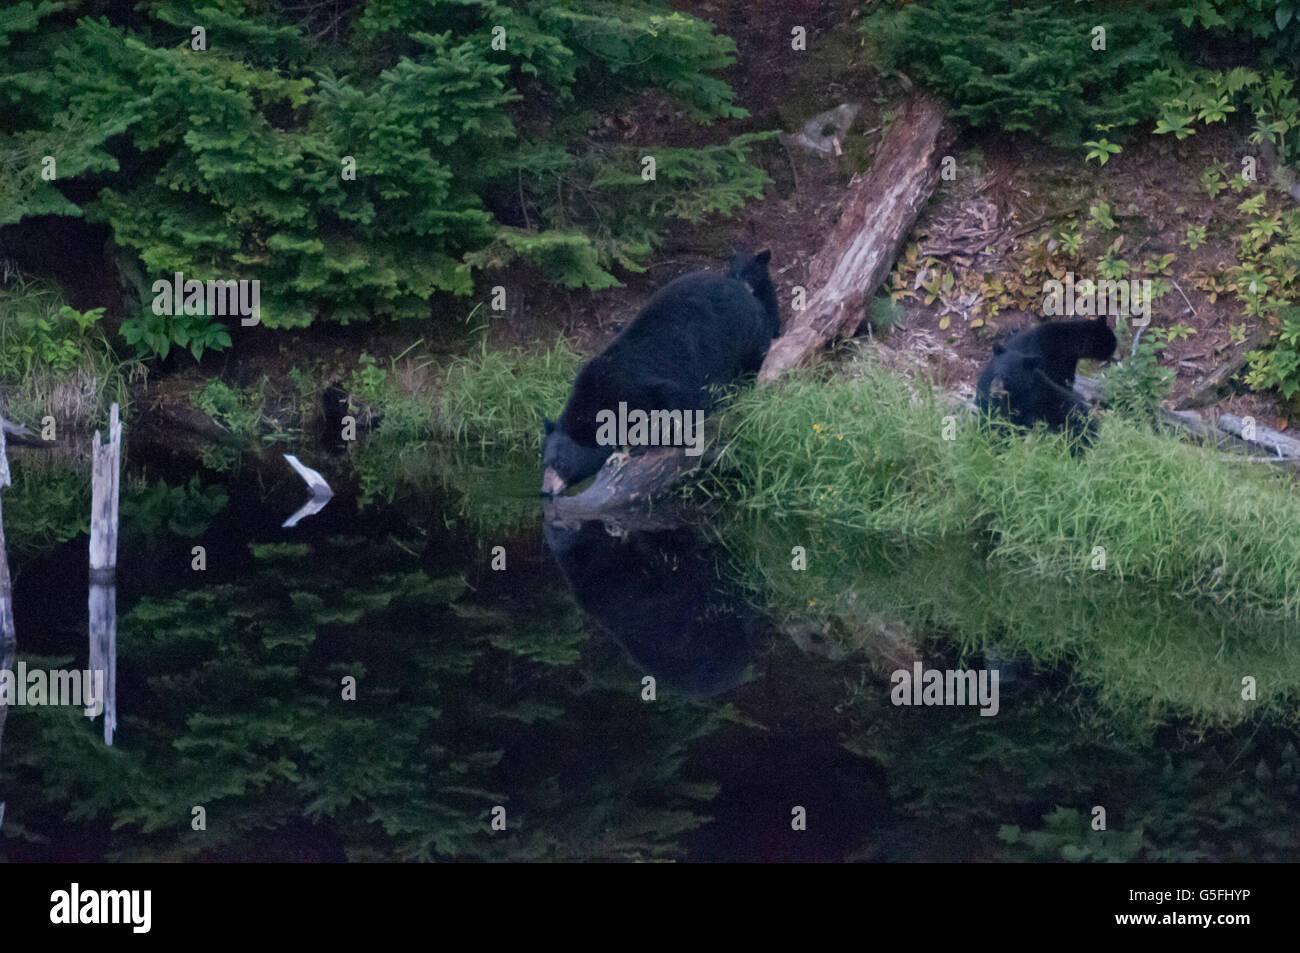 North America, Canada, Quèbec, Duchesnay Ecotourist Resort, Black bear viewing - Stock Image